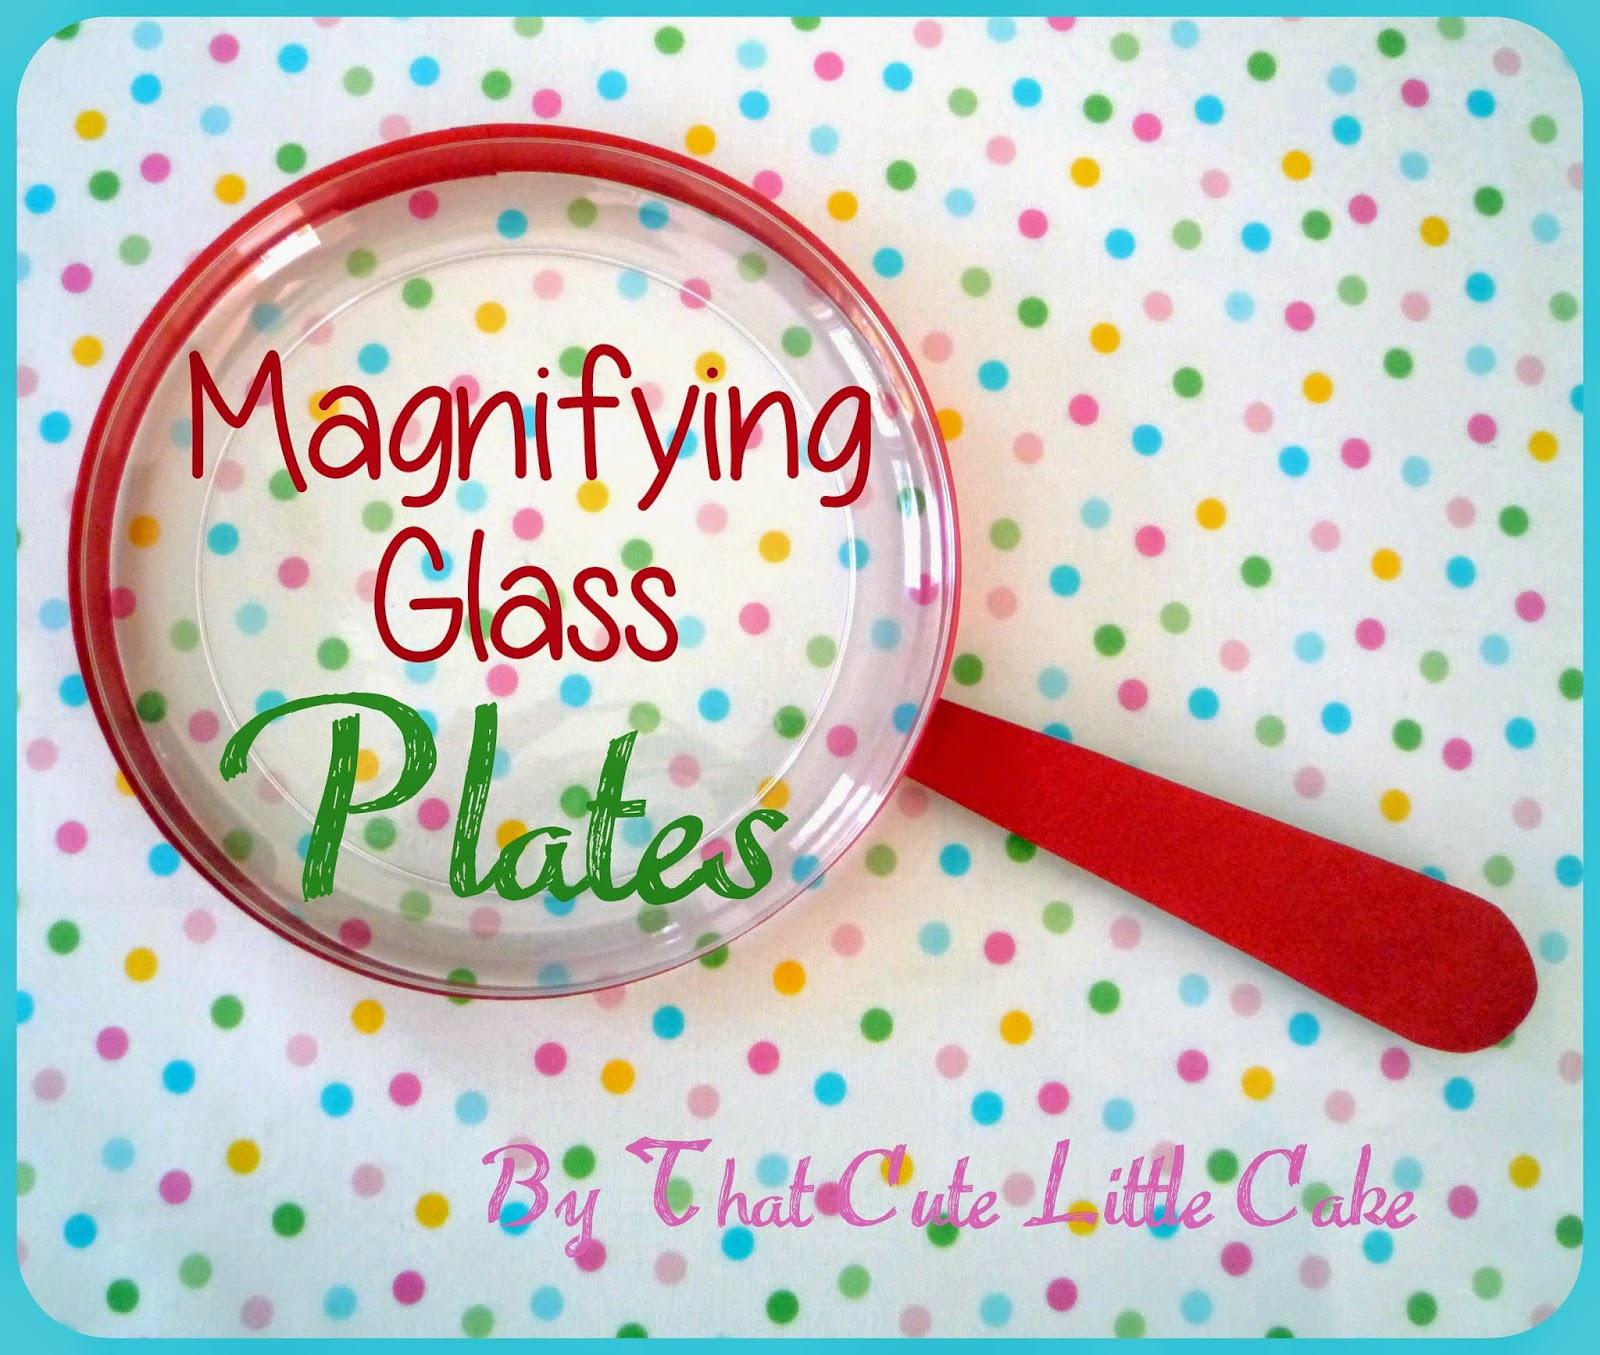 That Cute Little Cake Craft Magnifying Glass plates  : MagnifyingglassplatesHEADER from www.thatcutelittlecake.com size 1600 x 1355 jpeg 357kB